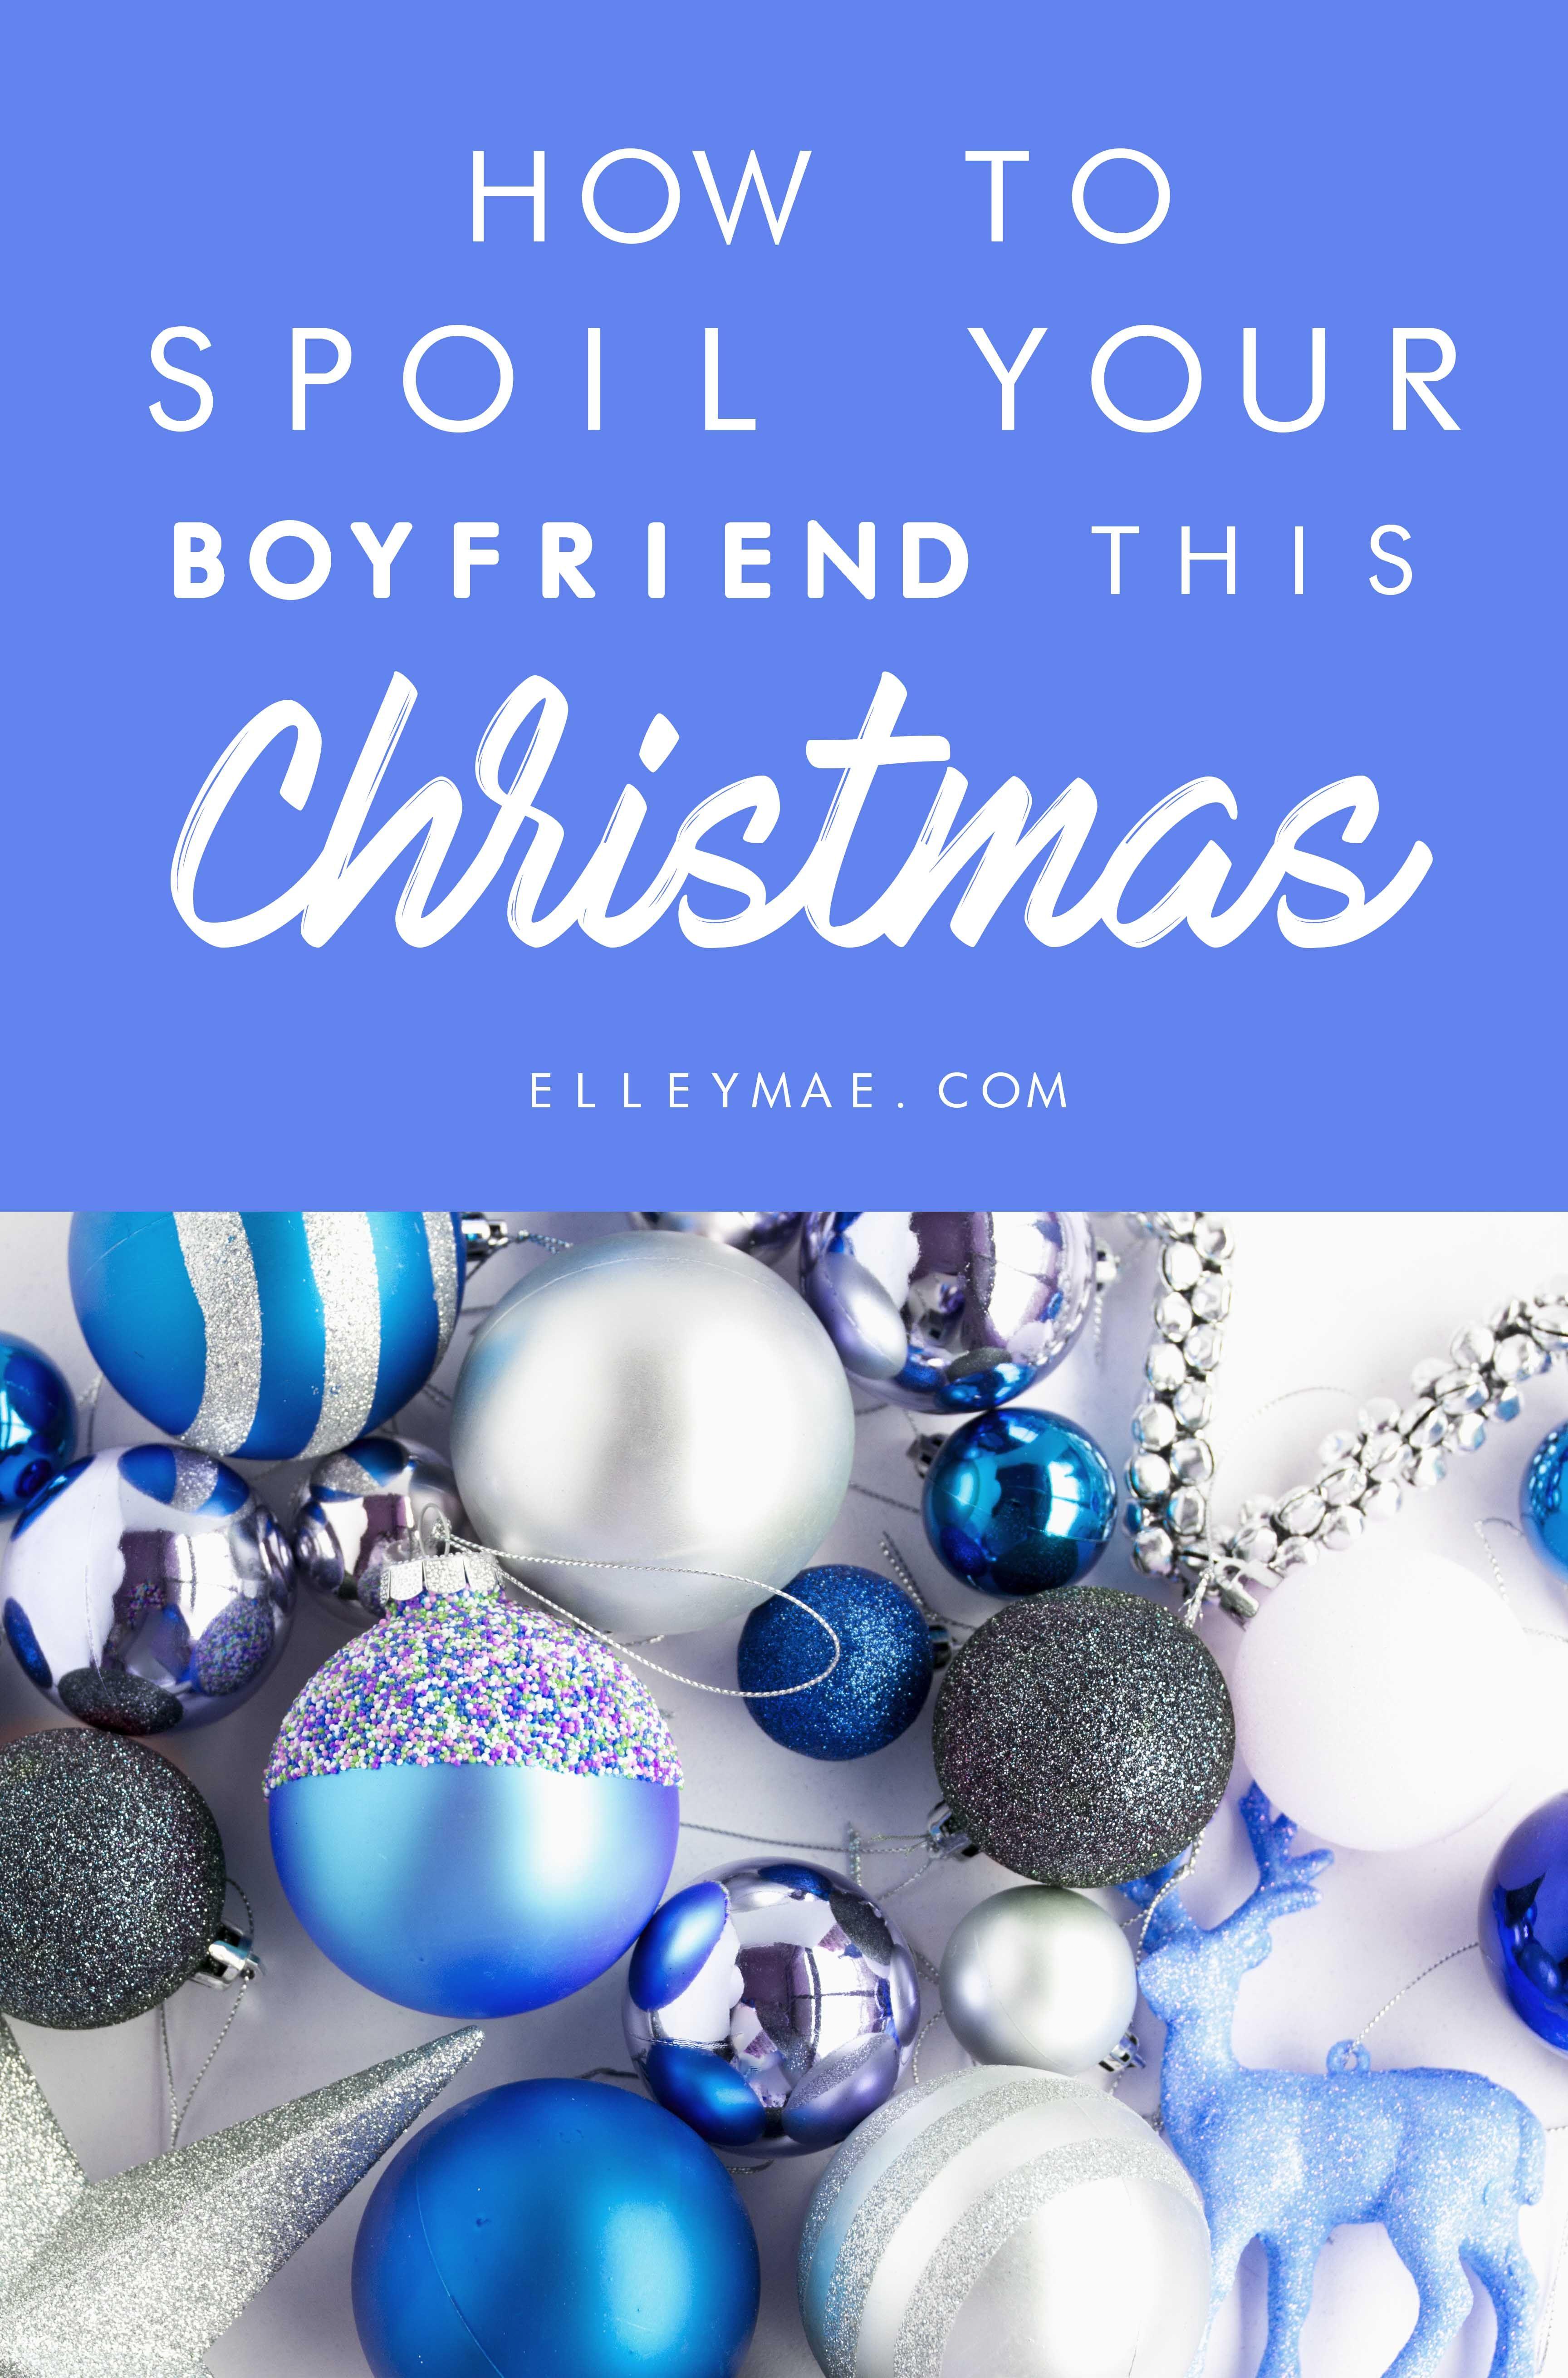 How To Spoil Your Boyfriend This Christmas | Boyfriend ...